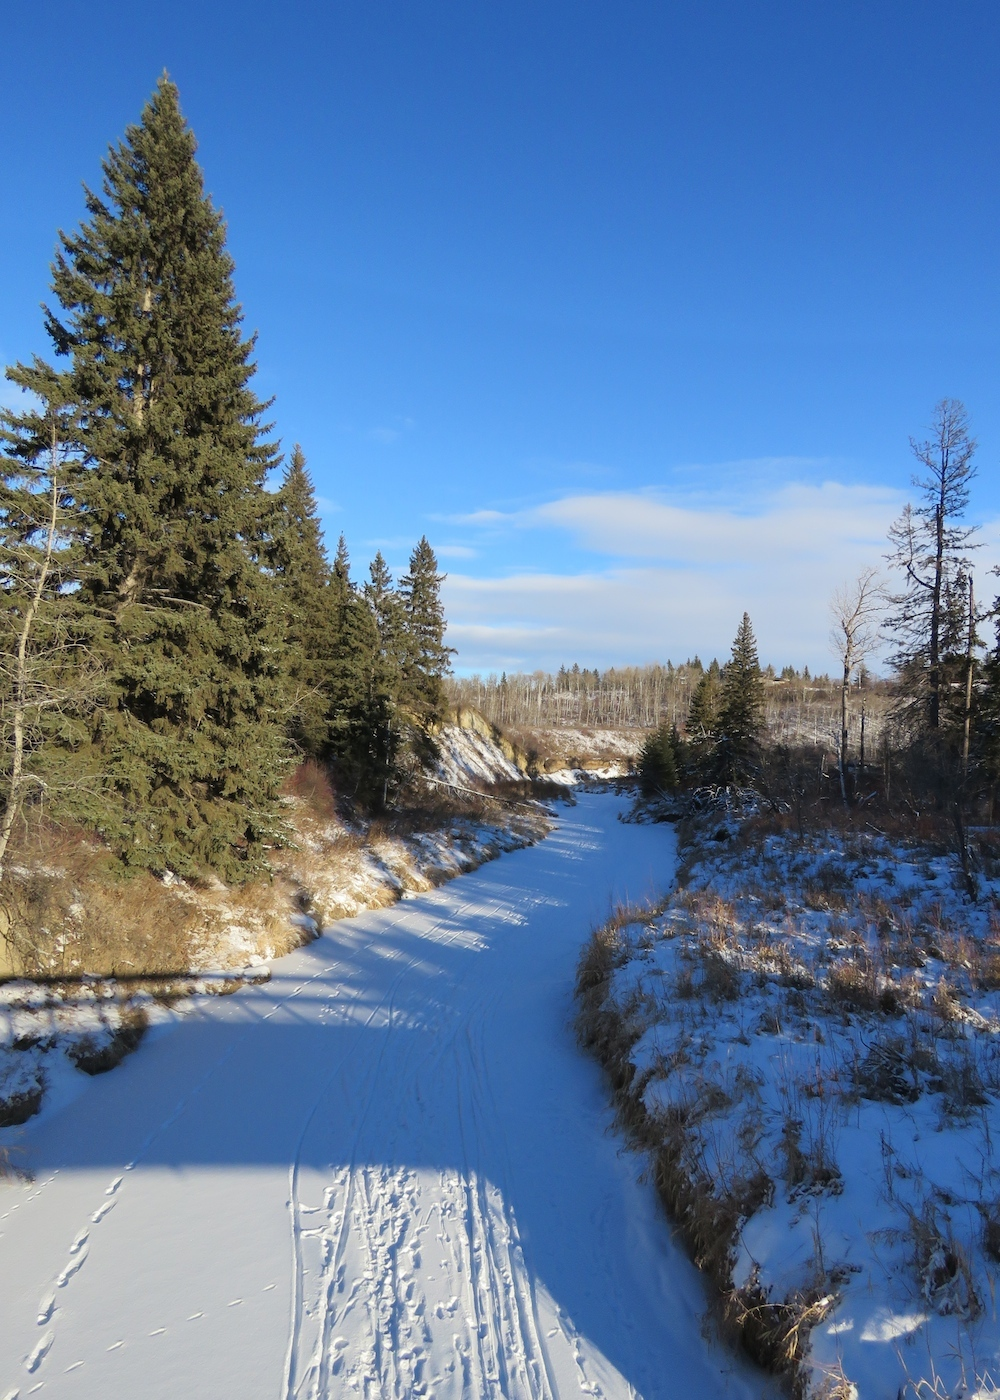 whitemud-ravine